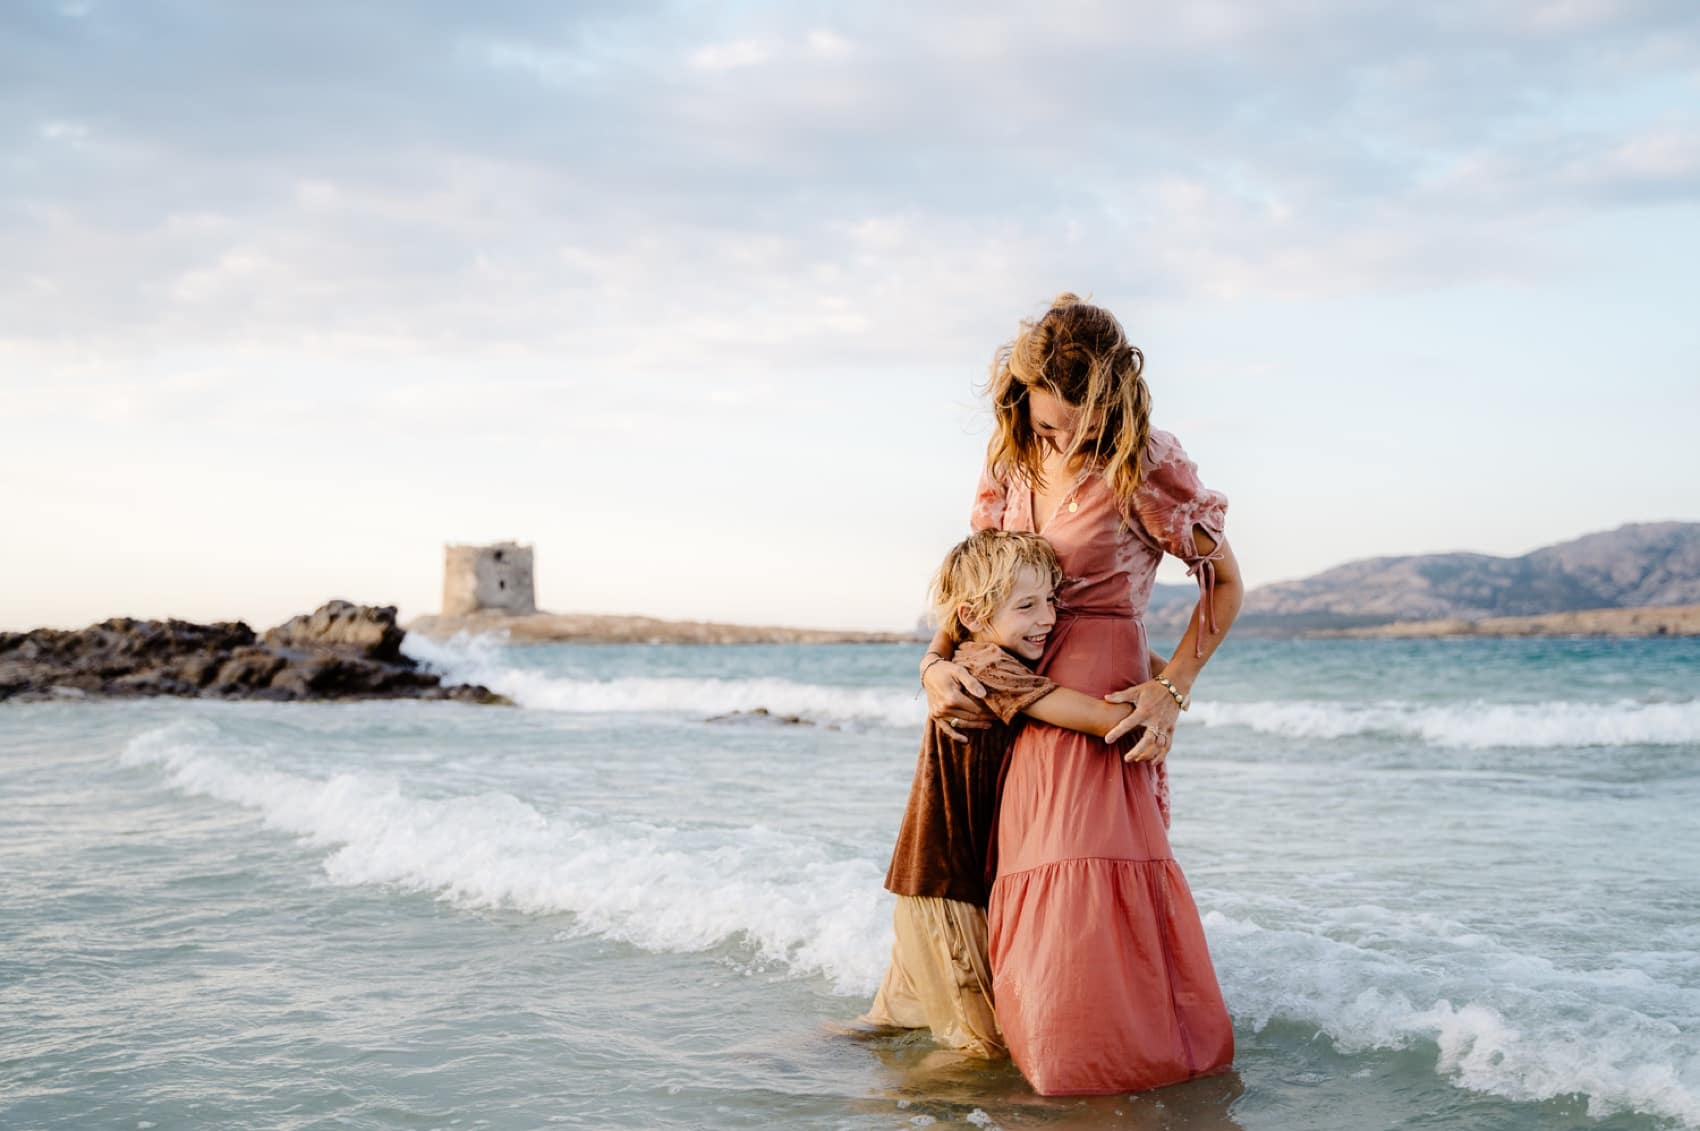 fotografo valeria mameli sardegna